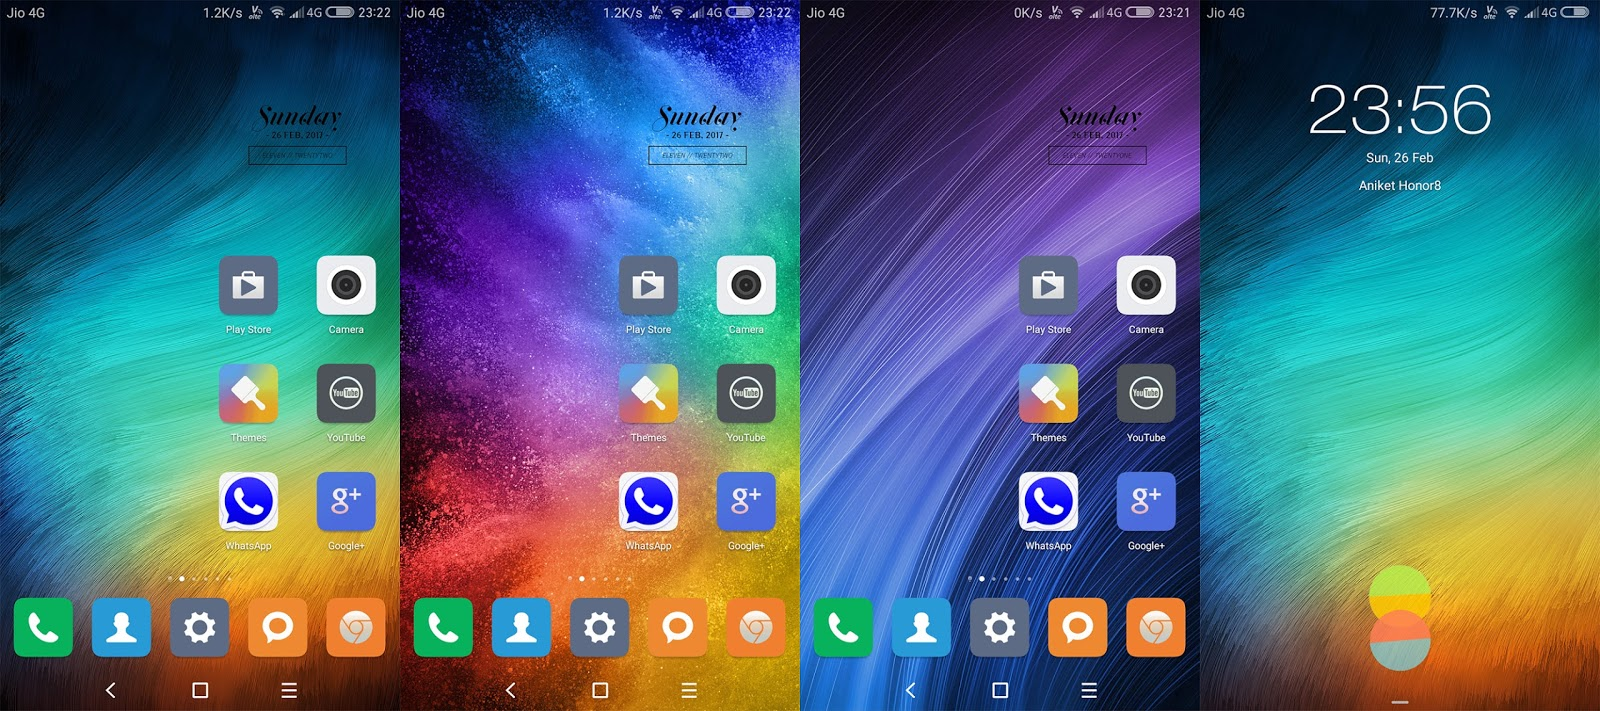 MIUI 8 MIX Theme for Huawei Emui 5 | Blog Raw